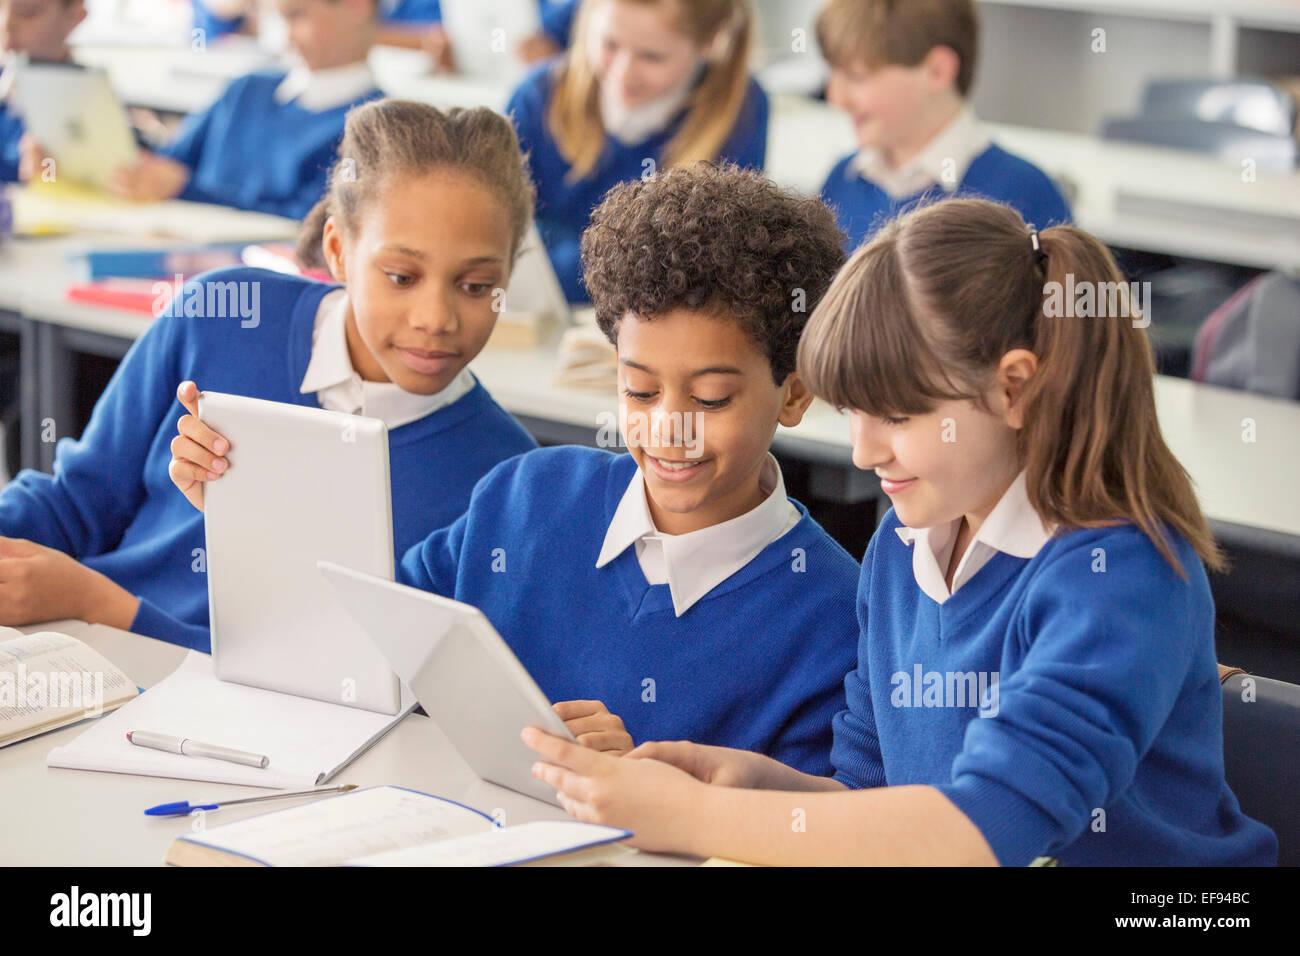 Elementary school children wearing blue school uniforms using digital tablets at desk in classroom Stock Photo